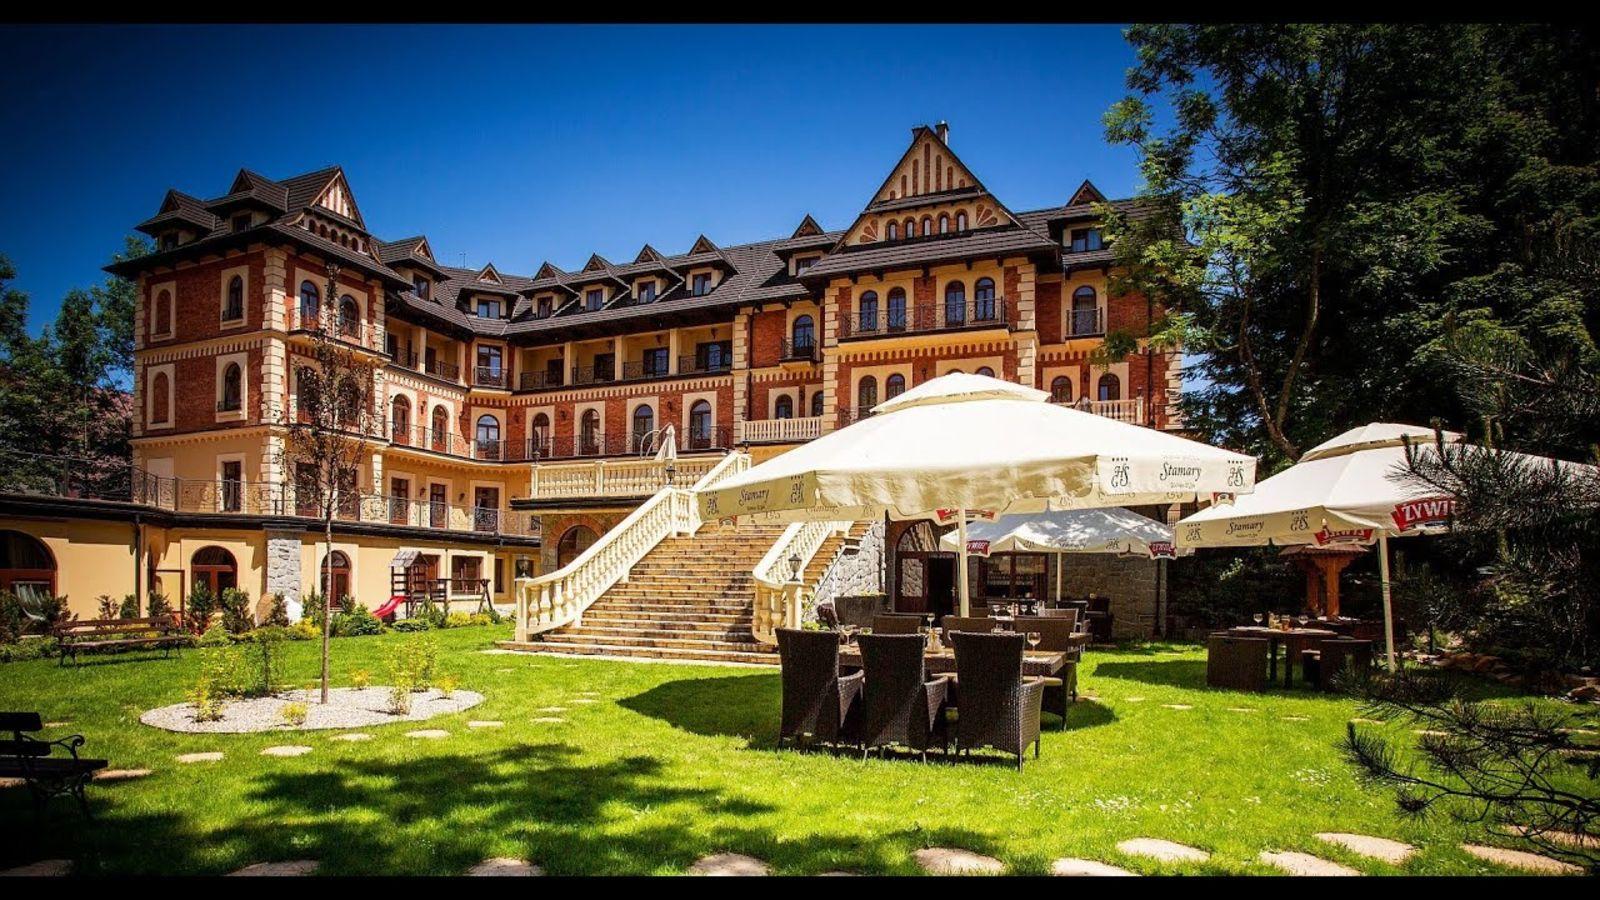 Impressions and Other Assets/Zakopane_Małopolskie_Grand_Hotel_Stamary_triverna_poland_aghkly